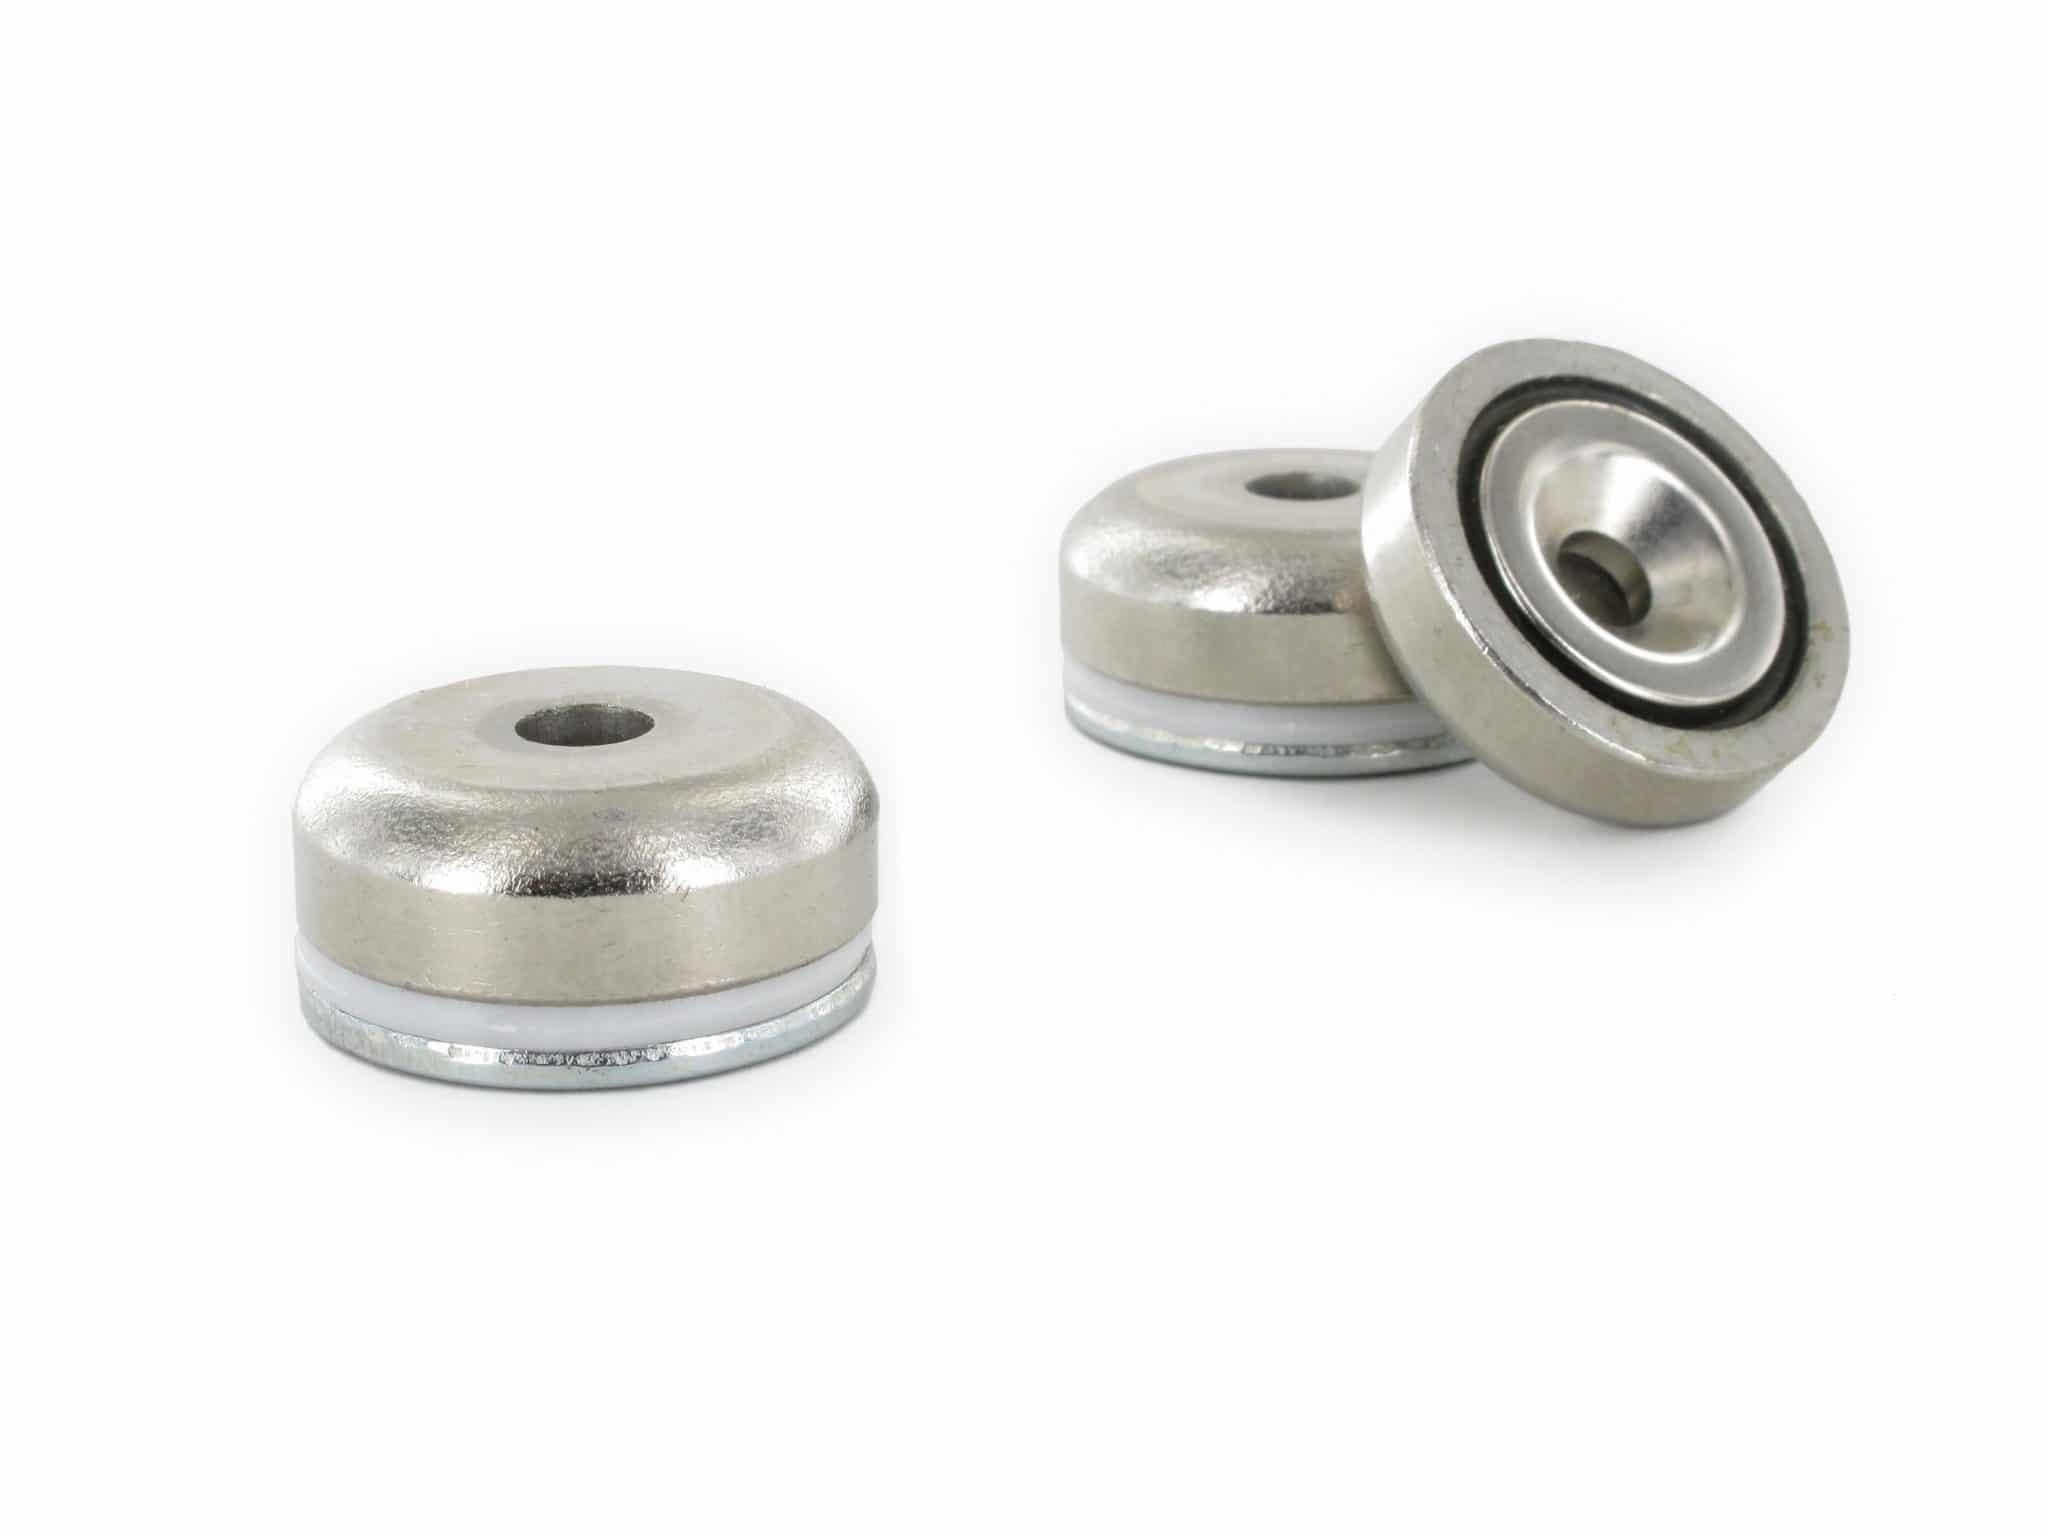 Three Countersunk Pot Magnets